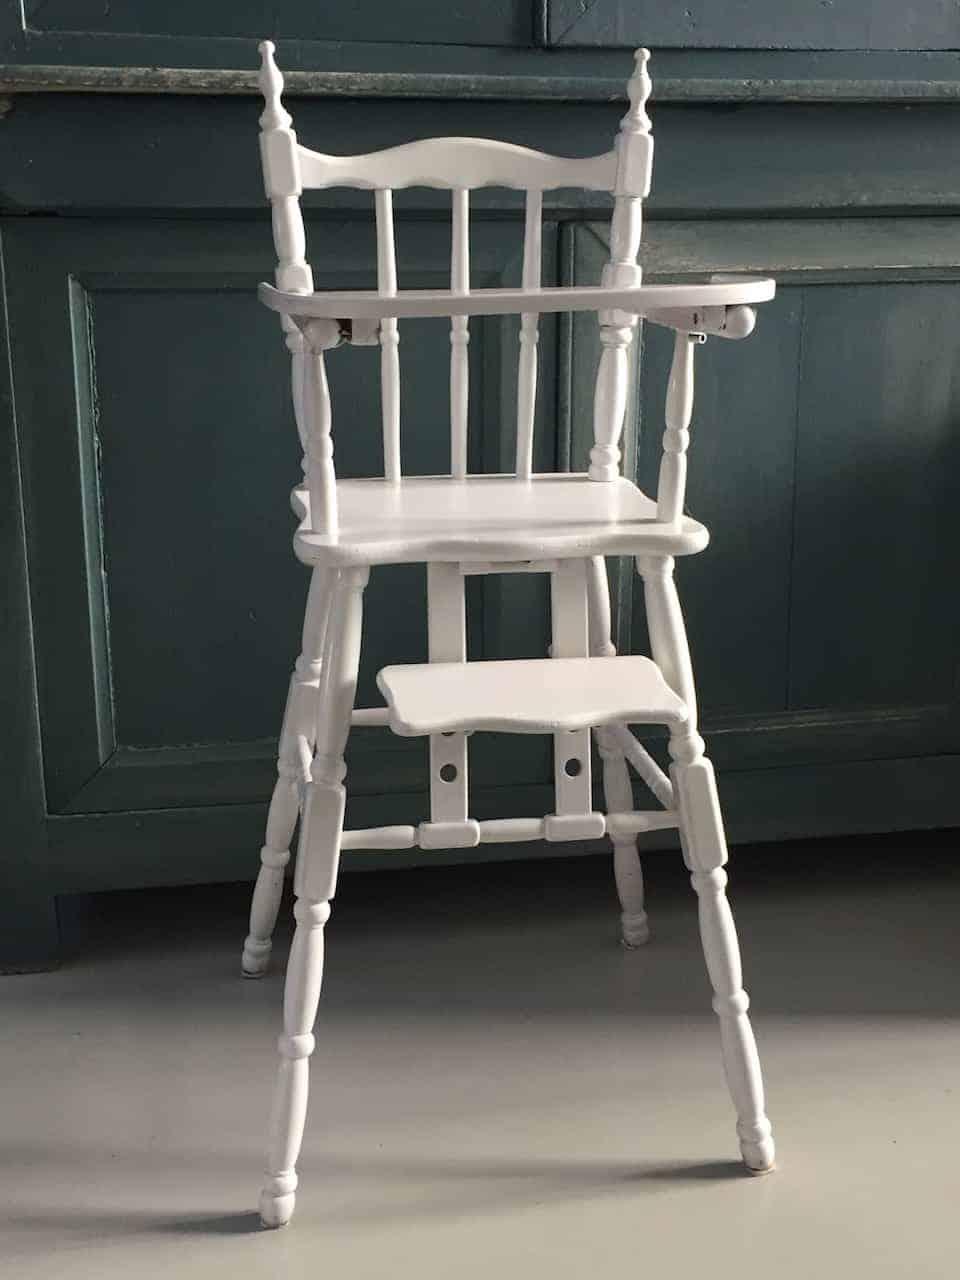 Ouderwetse Houten Kinderstoel.Oude Kinderstoel Cedante Brocante Interieurstyling